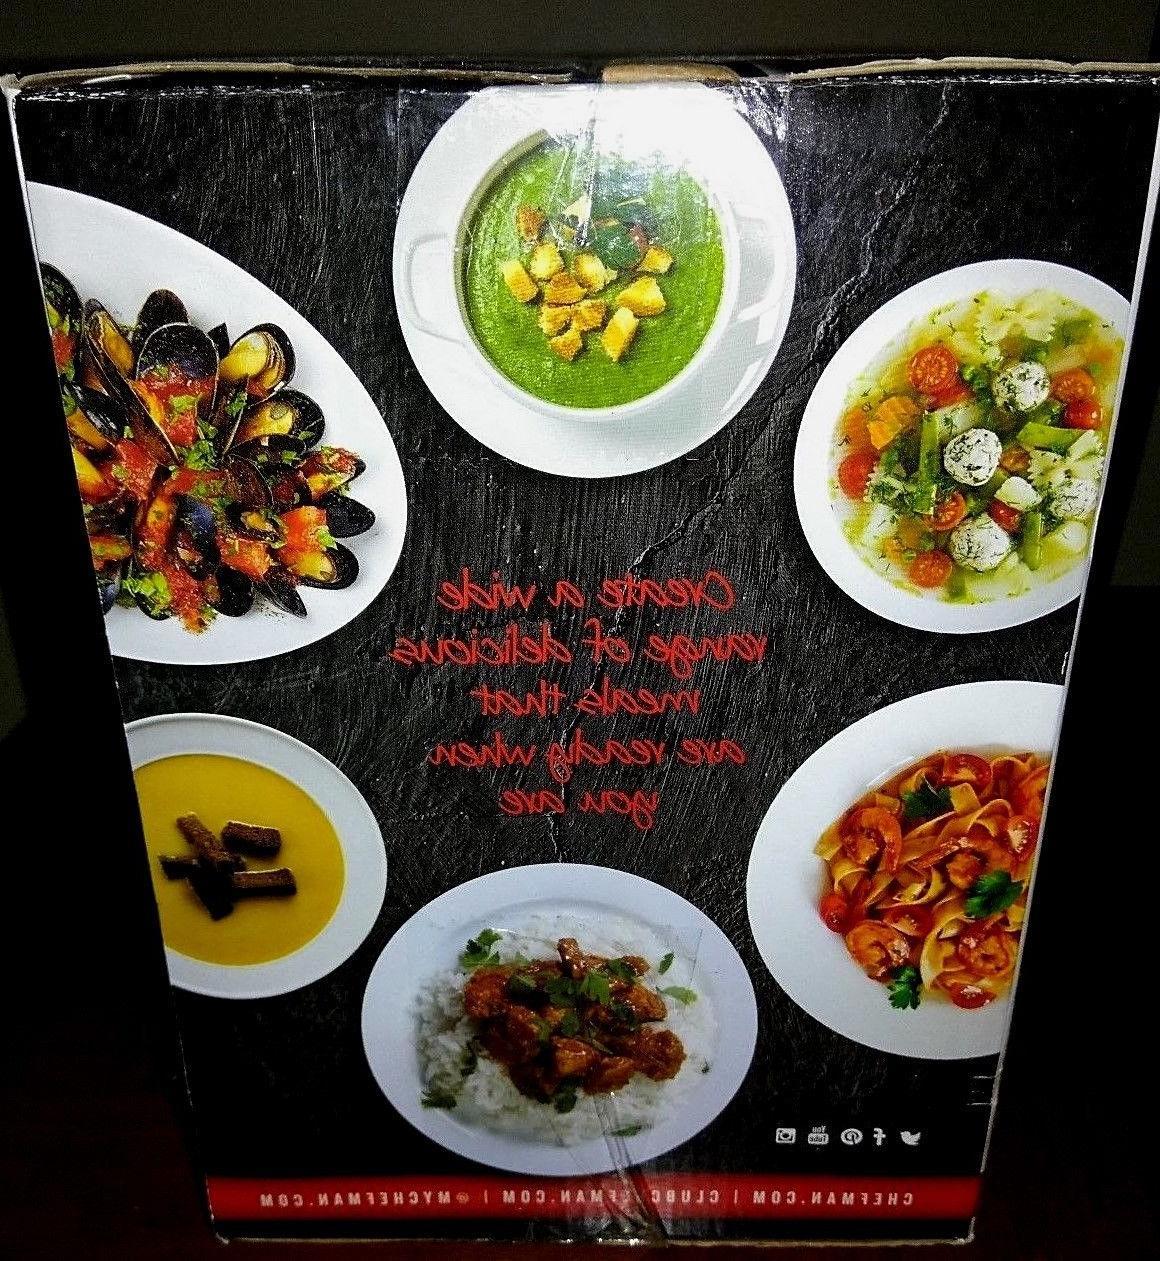 Chefman Quart Ideal 2 People Roast RJ15-15-OPP-BLK